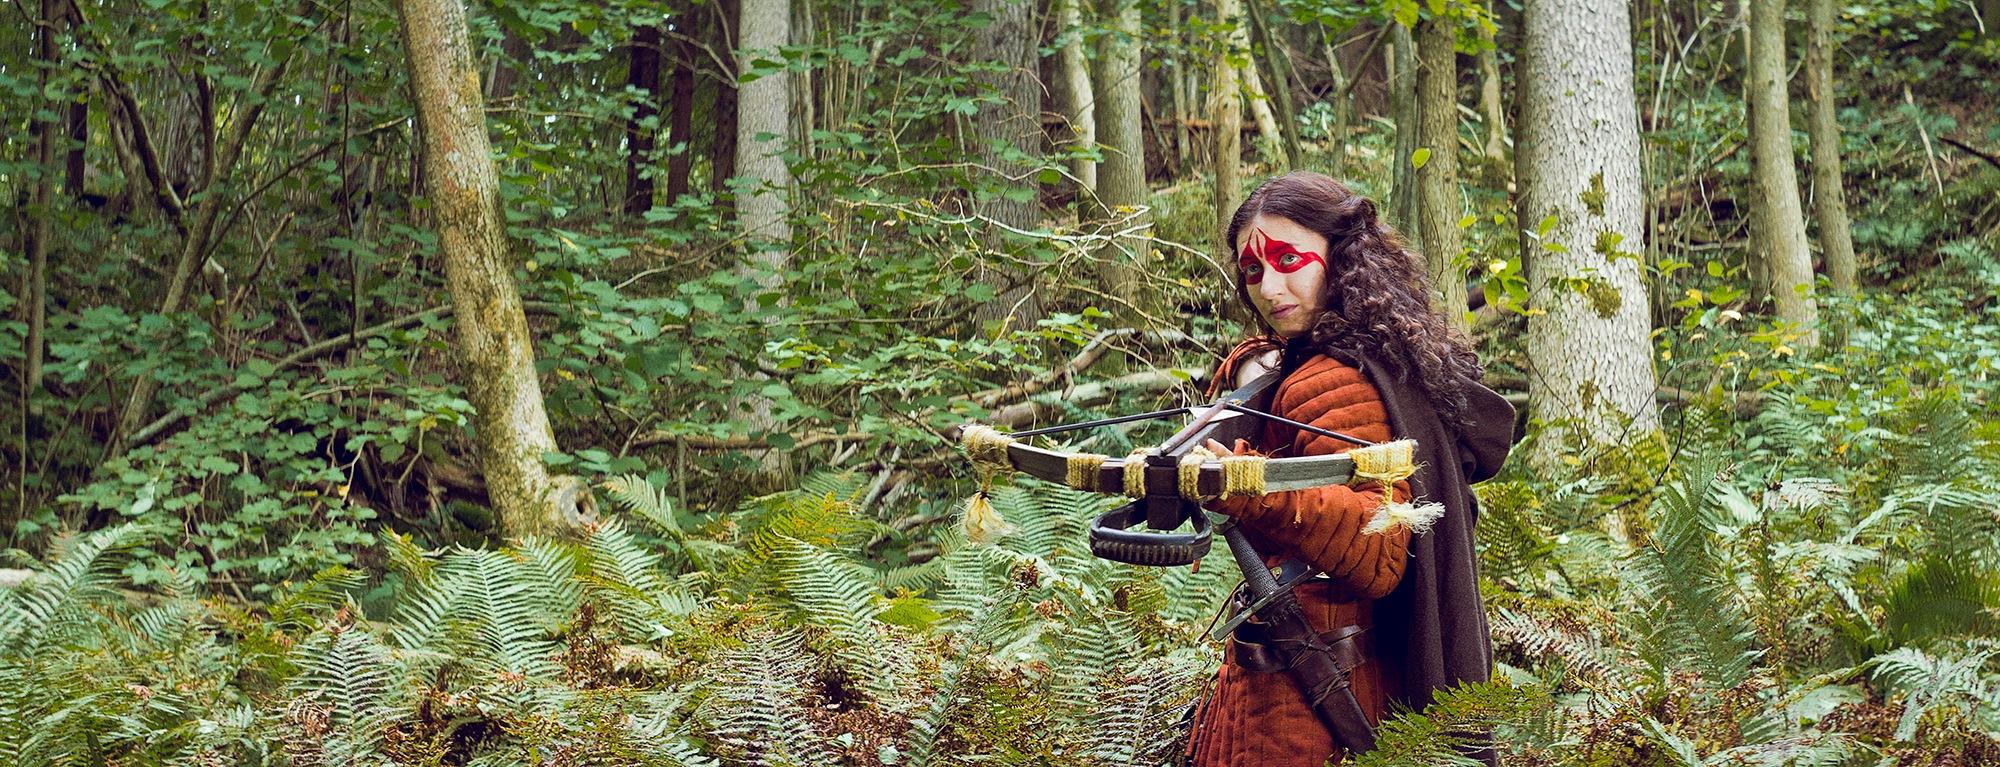 Medieval hunter. by David Nilsson